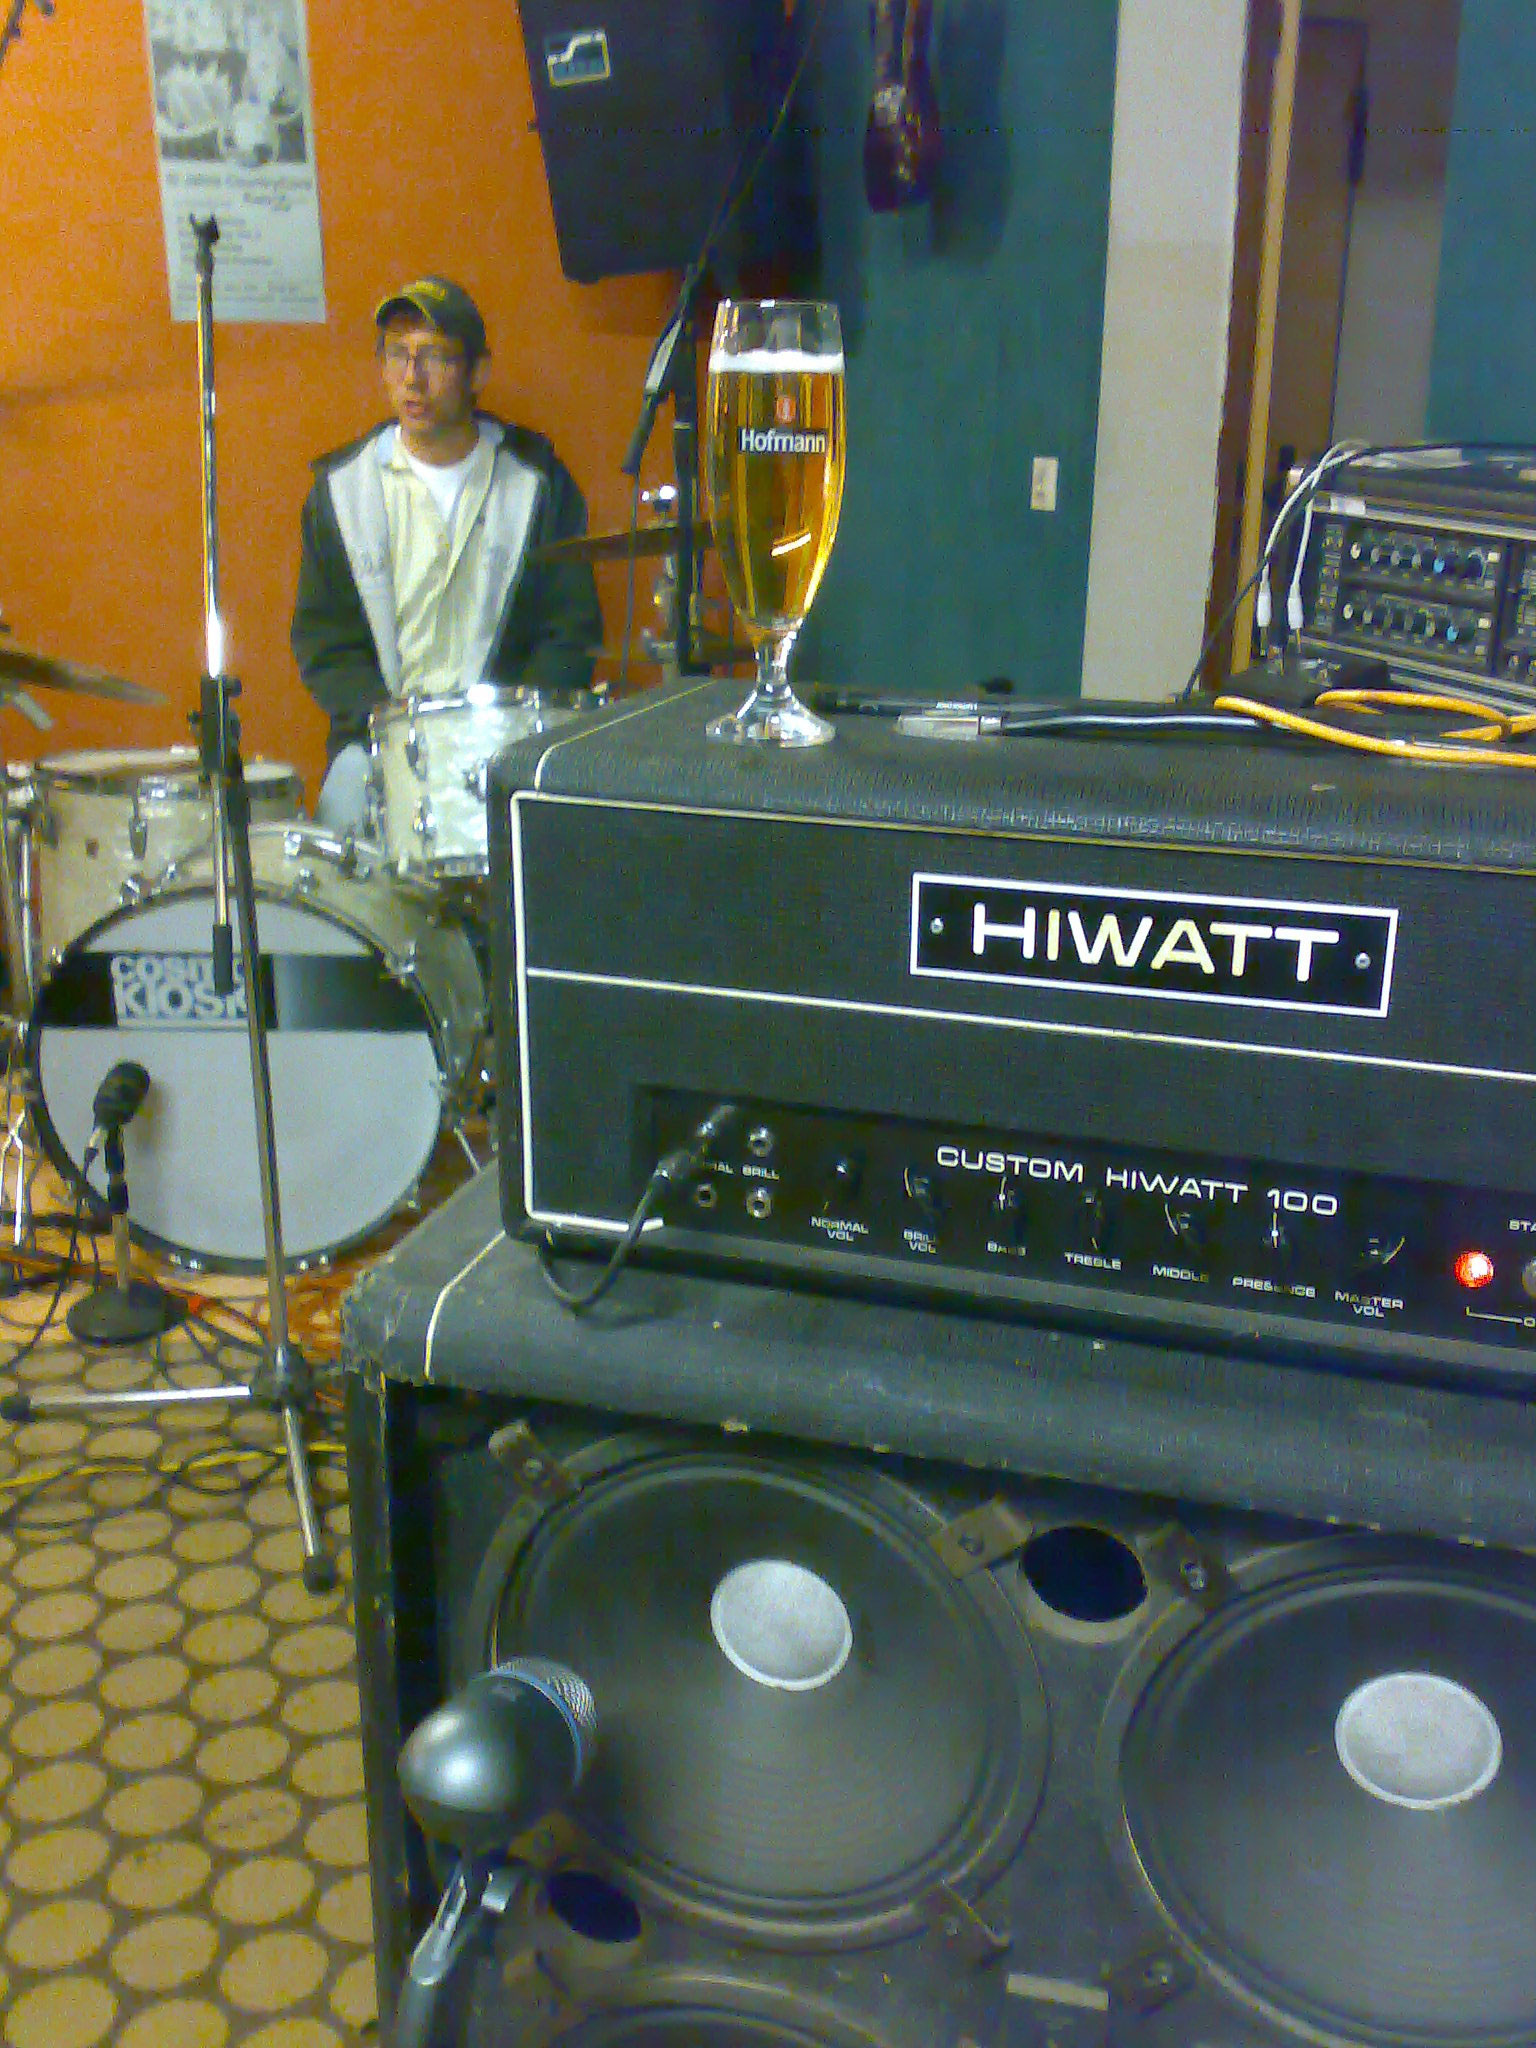 13102010-hofmann-hiwatt-1